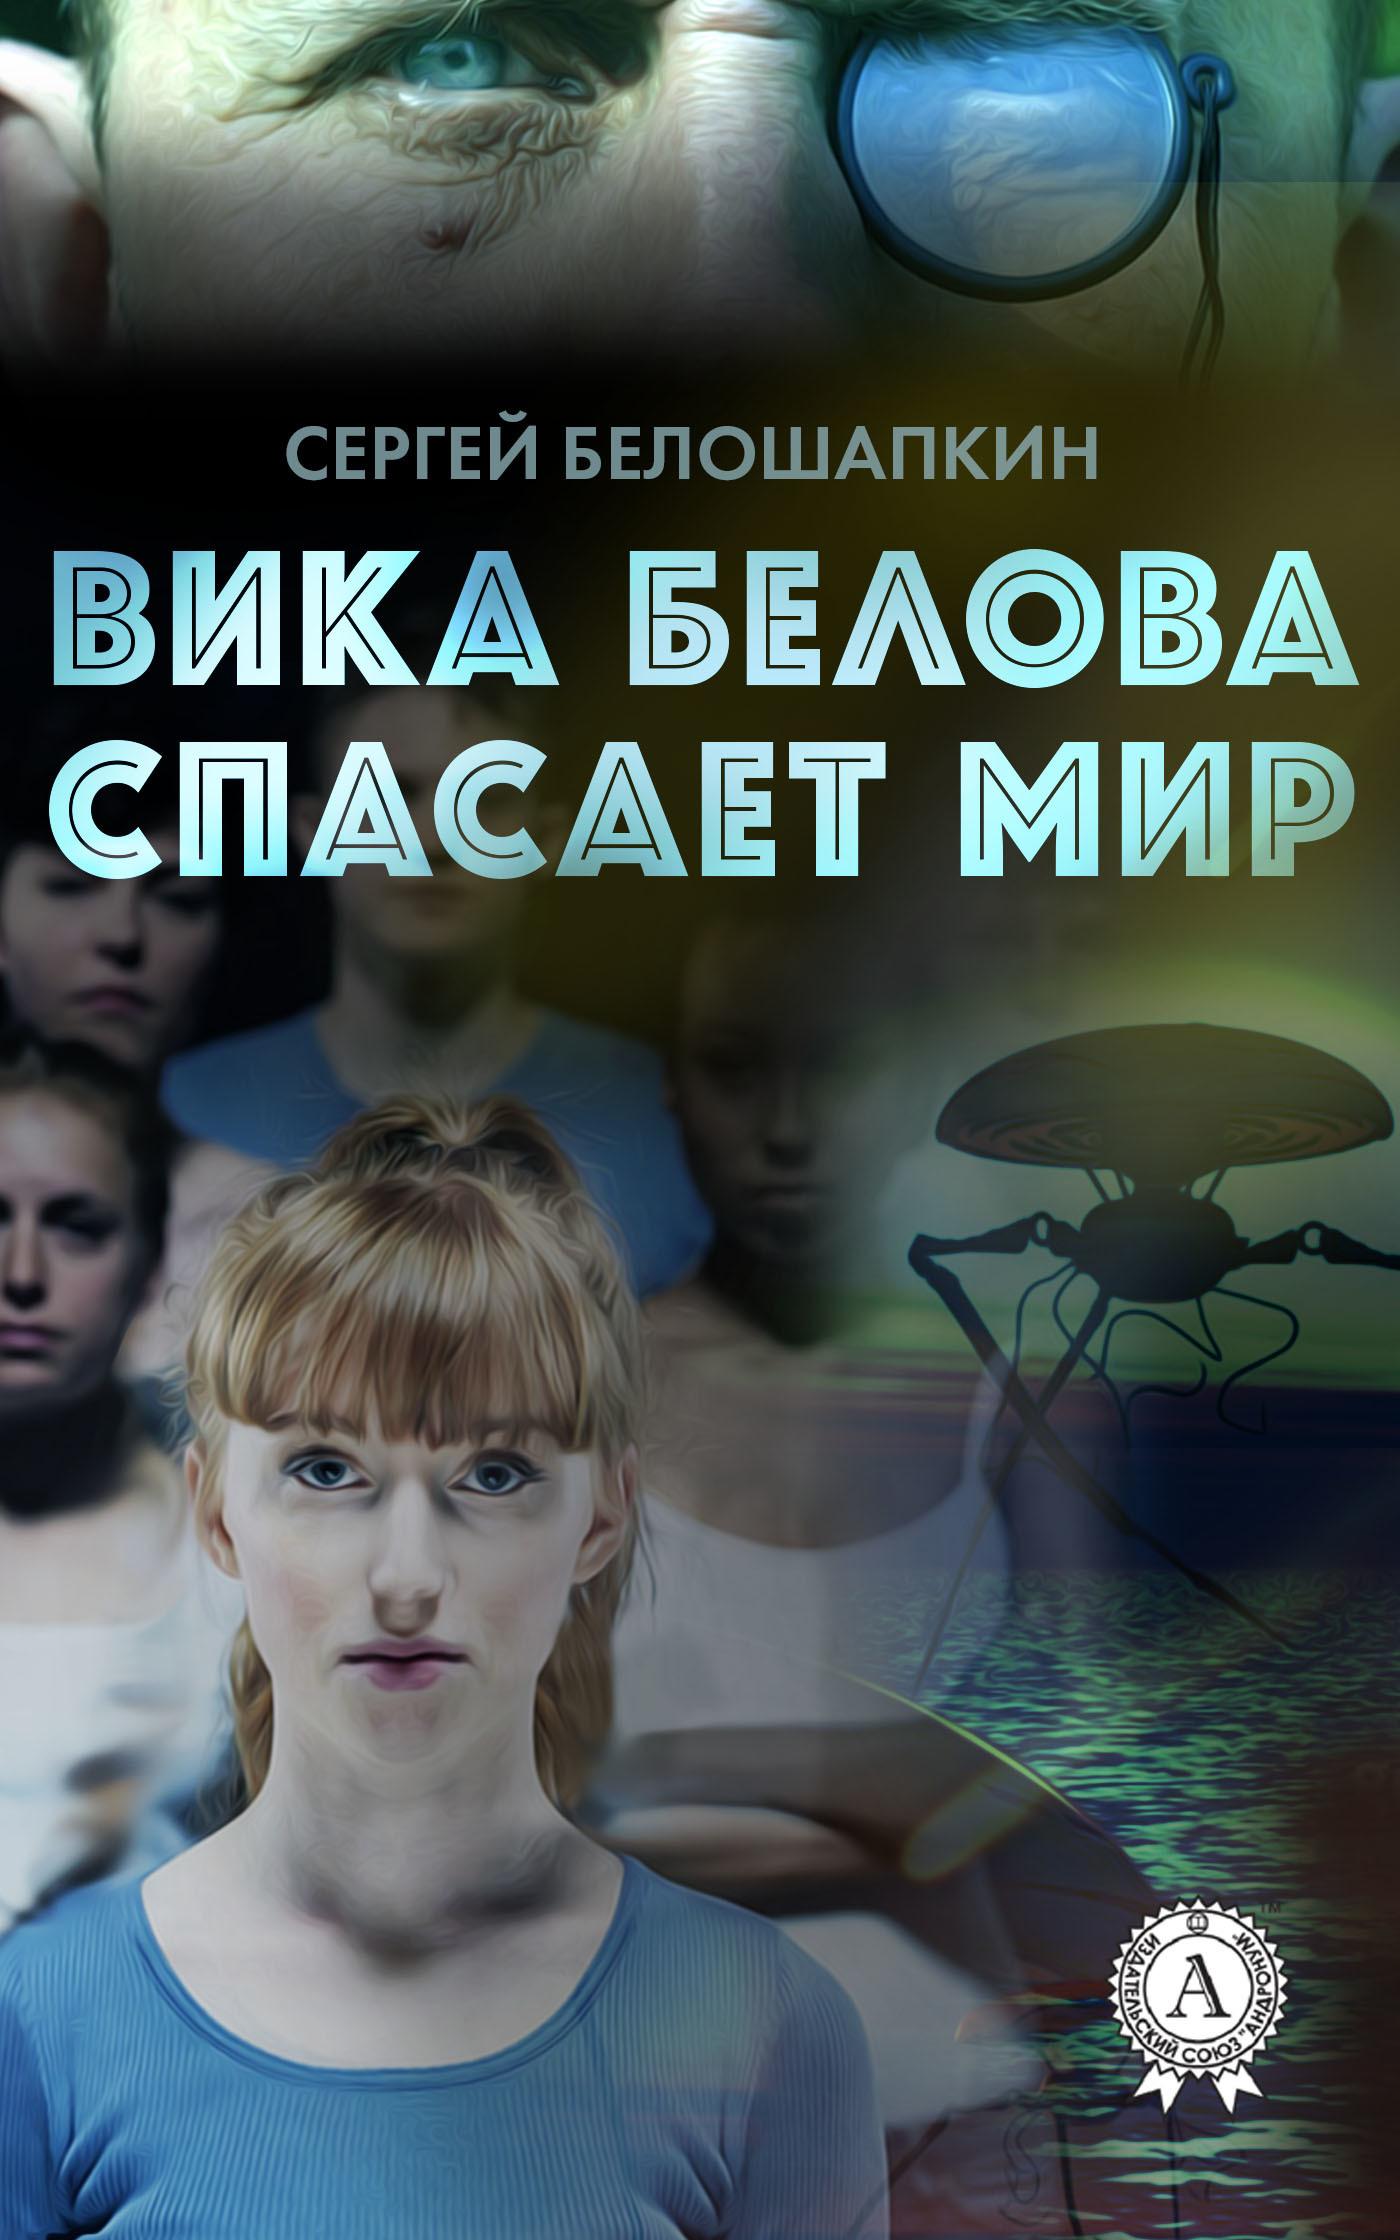 Вика Белова спасает мир